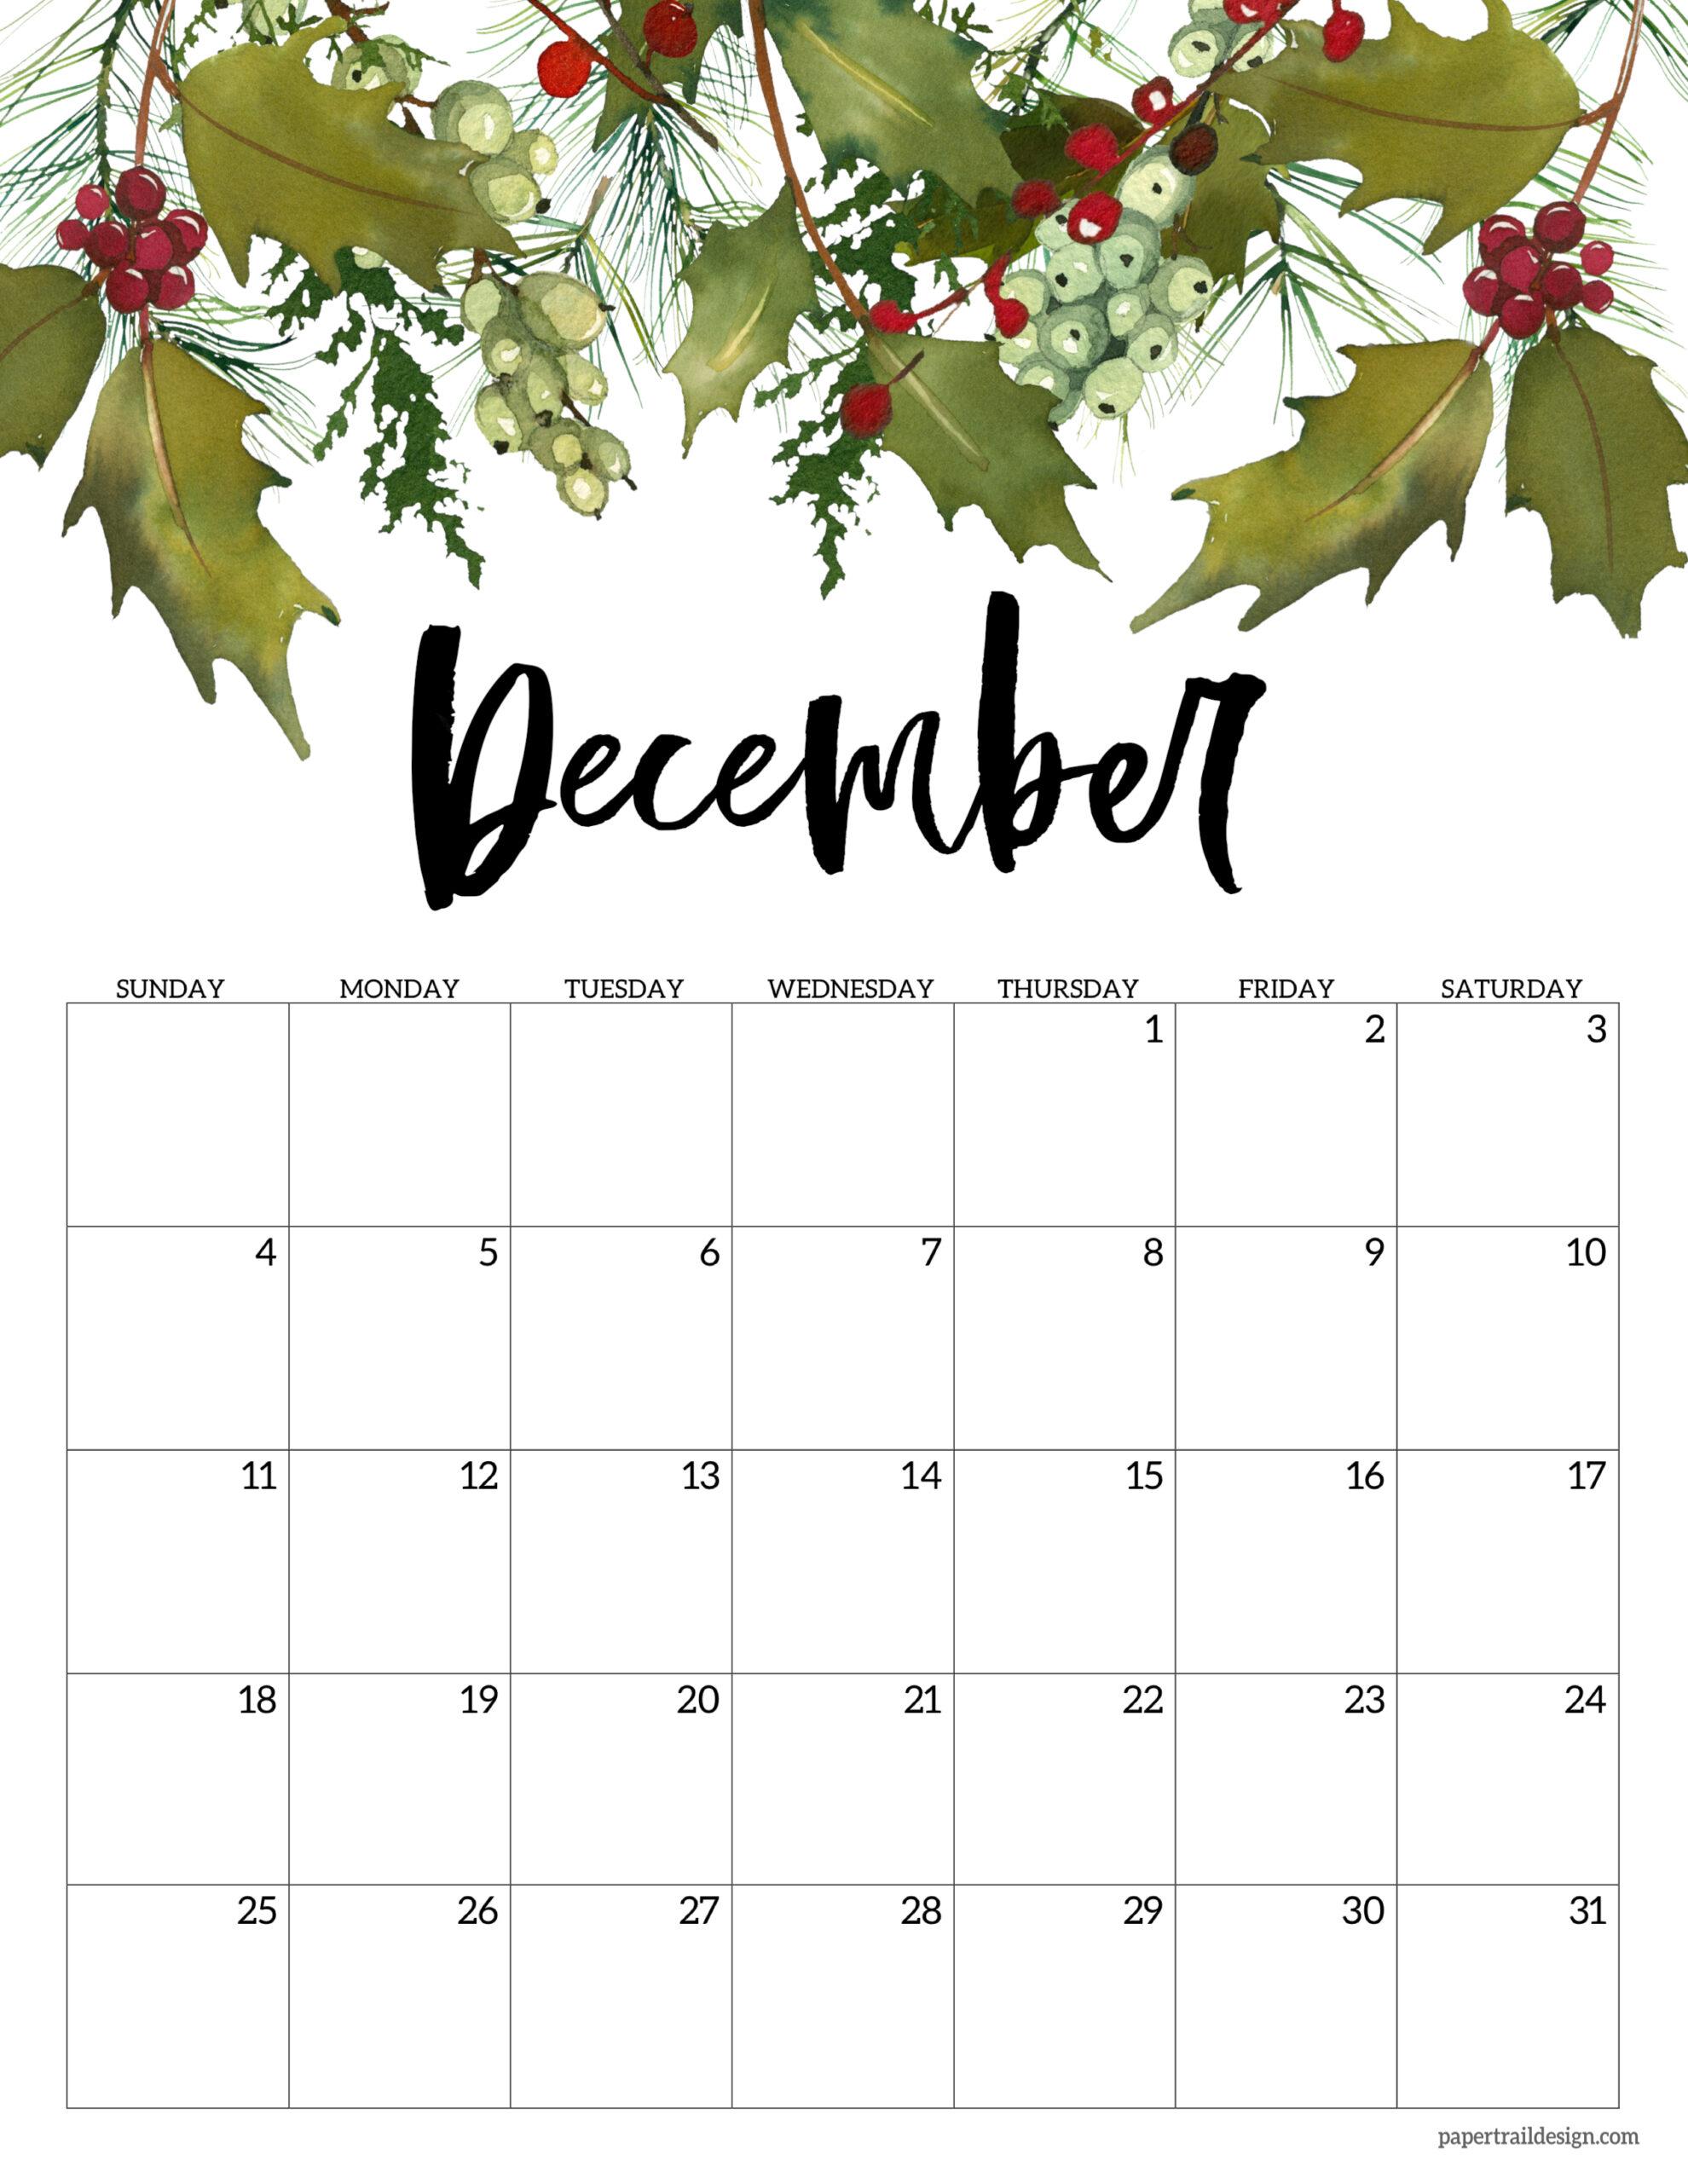 Dec Calendar 2022 Printable.Free 2022 Calendar Printable Floral Paper Trail Design